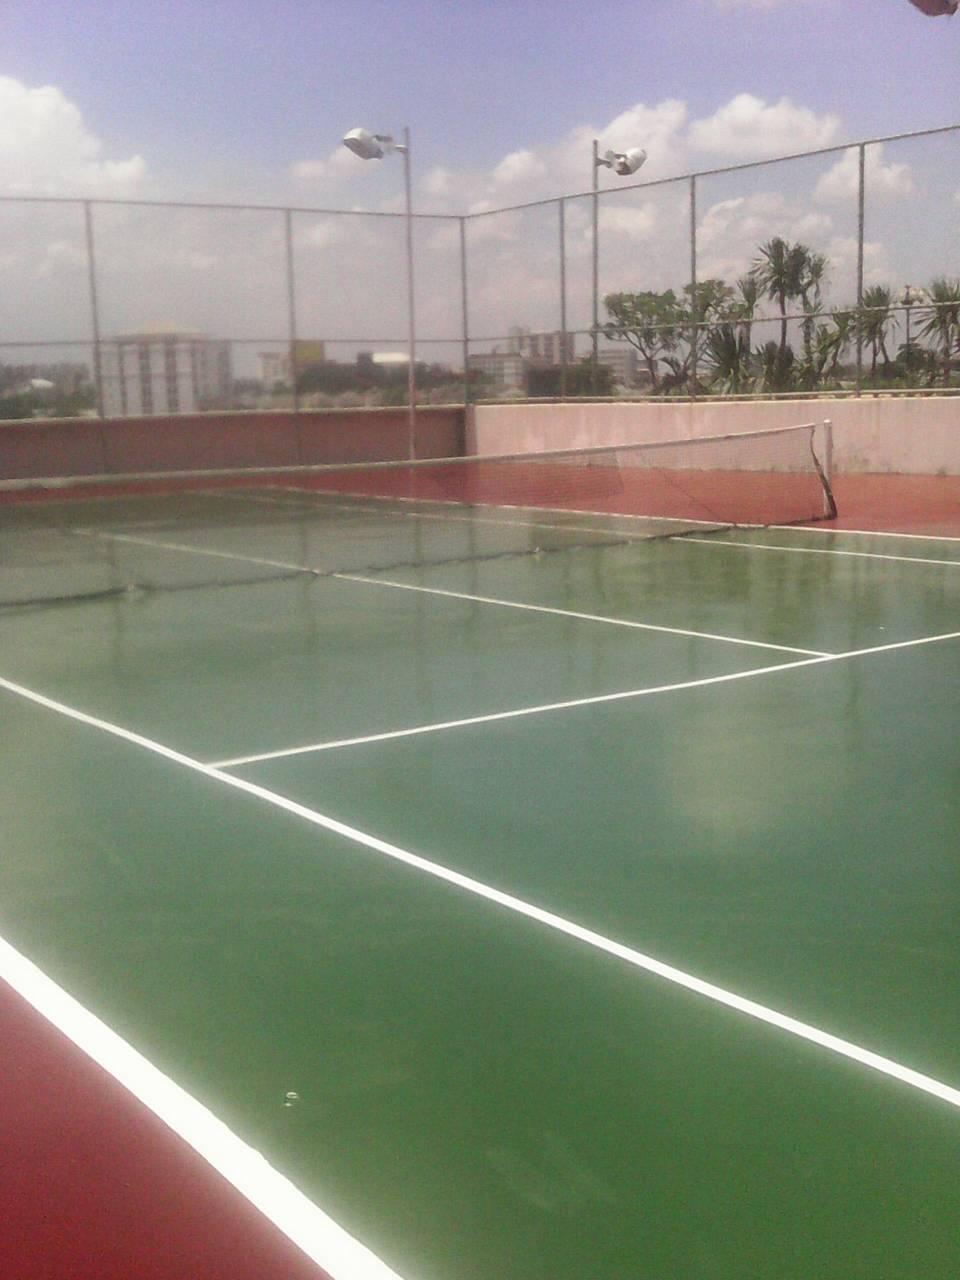 SPORT FLOORING   สนามกีฬากลางแจ้ง ระบบ POLYURETHANE , ในร่มระบบ ACRYLIC COATING